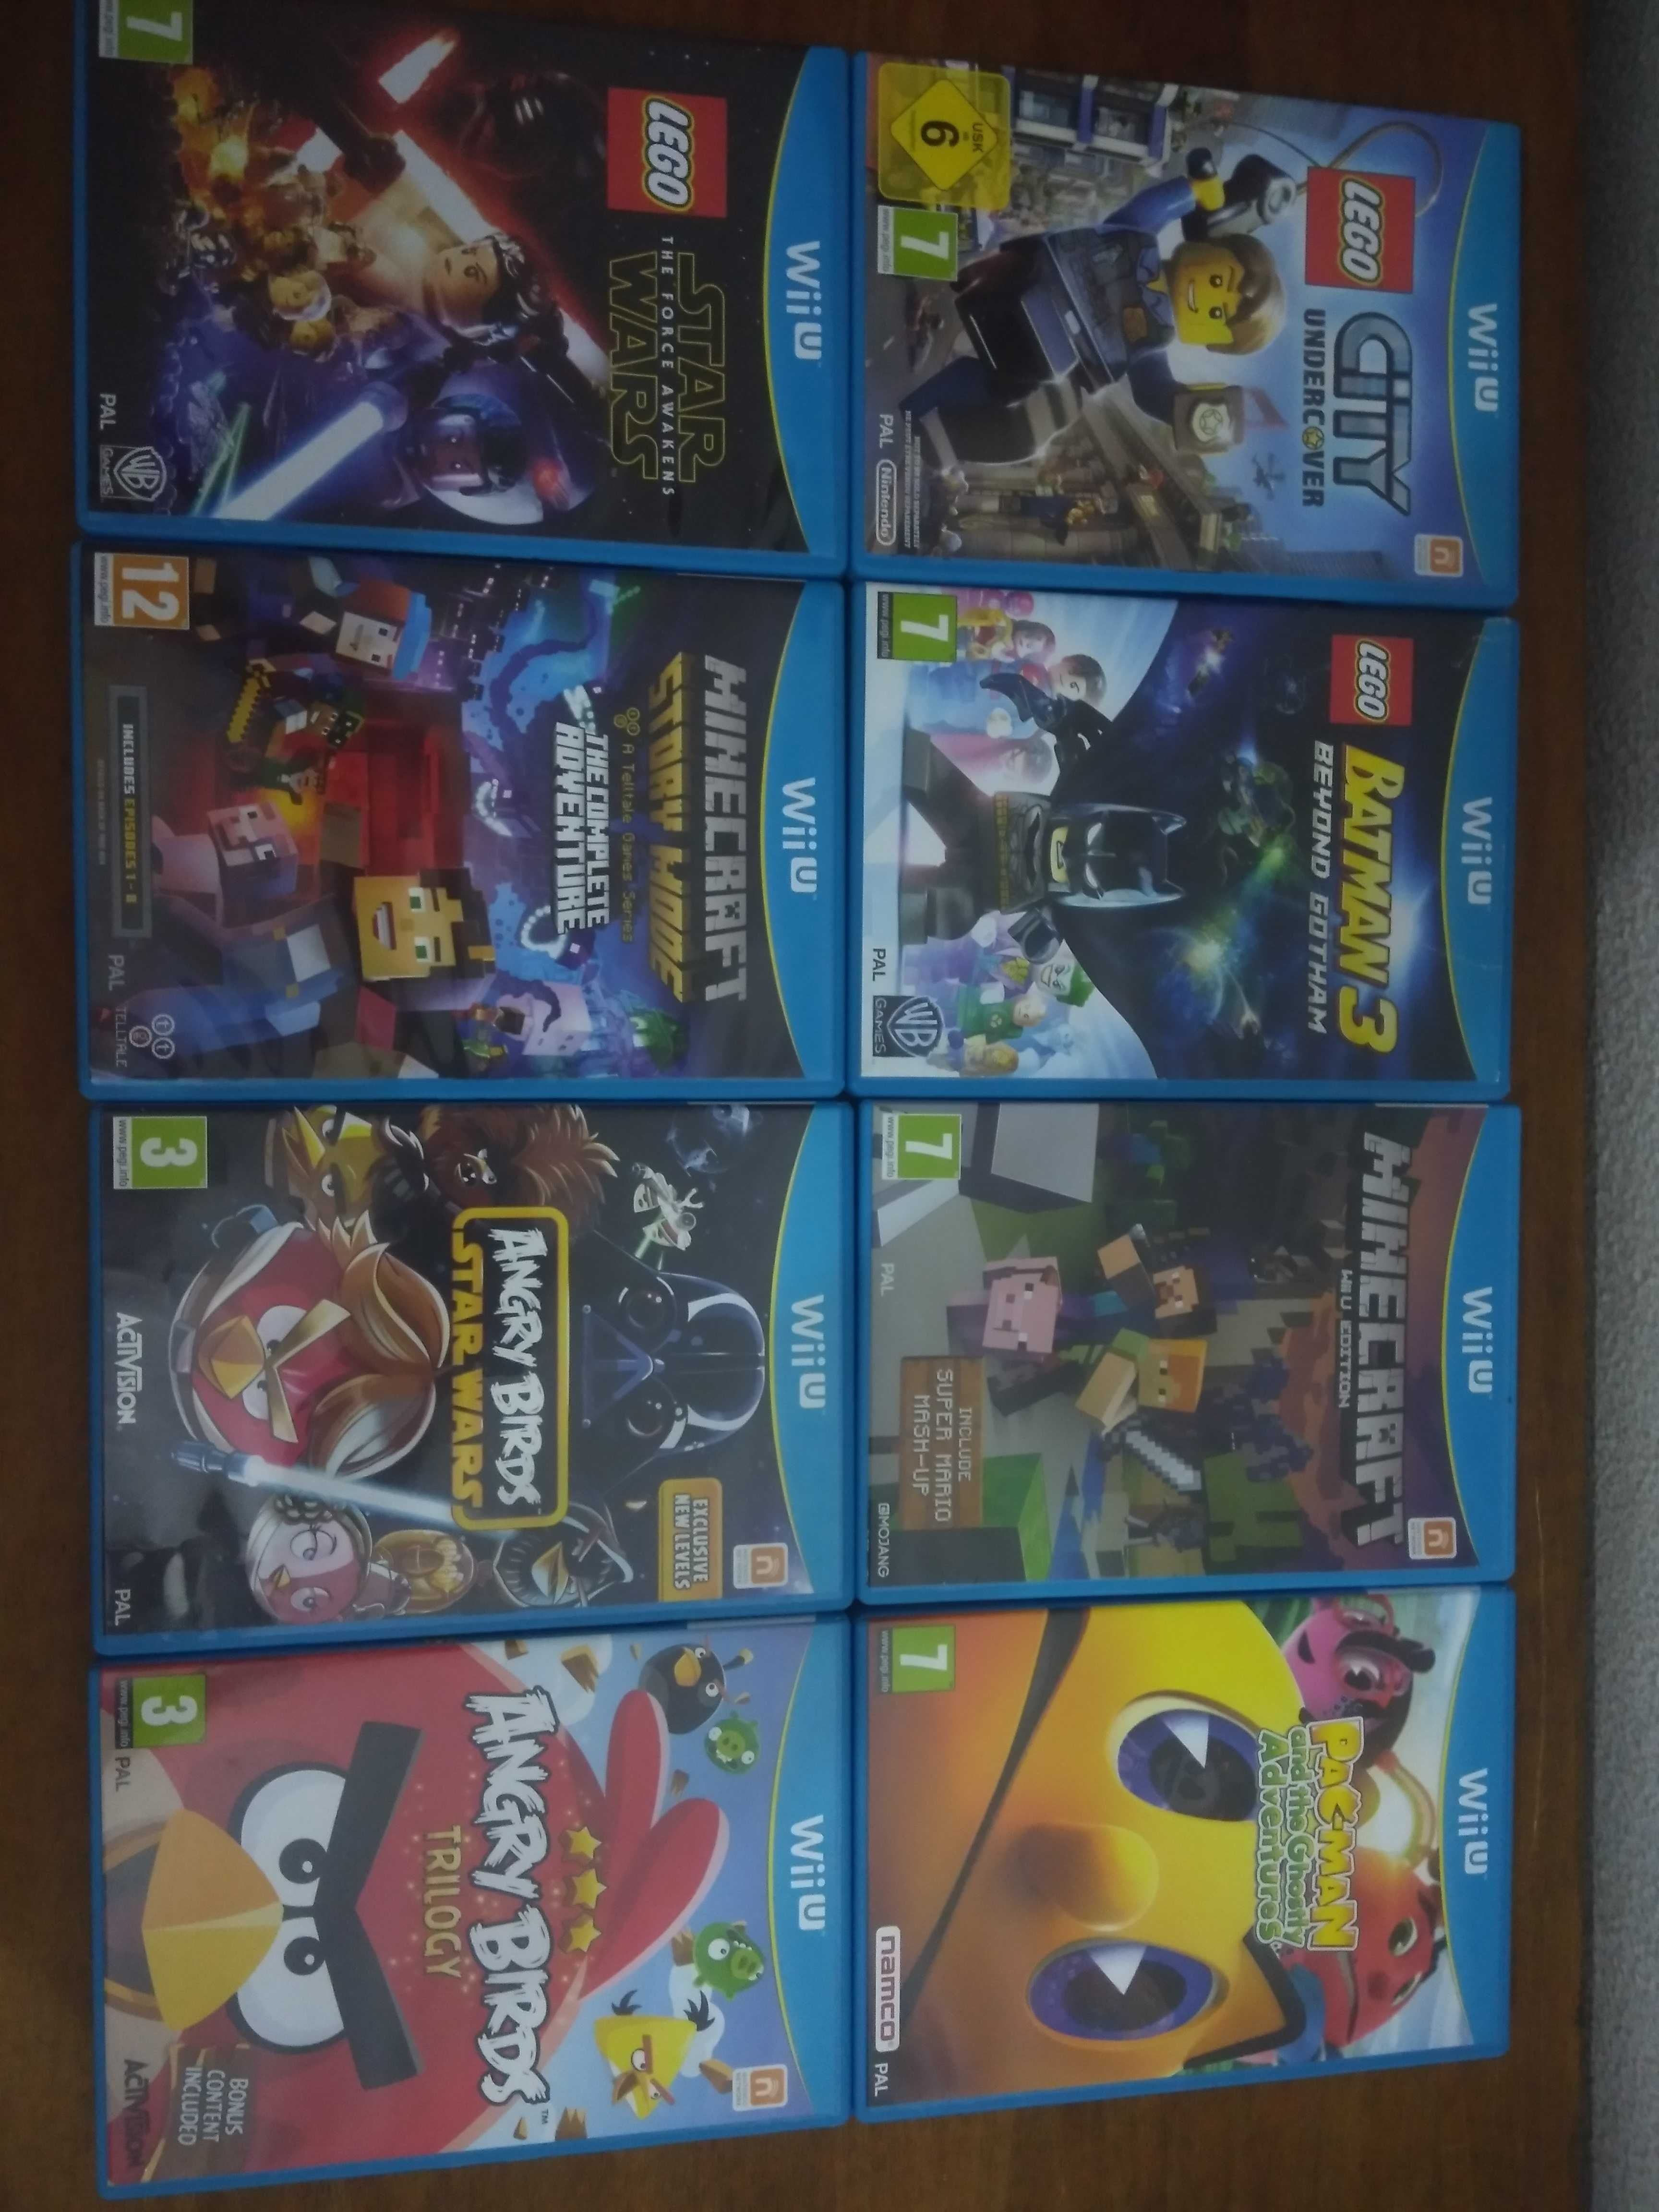 Jogos Wii U Legend of Zelda, Super Mario, Sonic, Lego, Minecraft